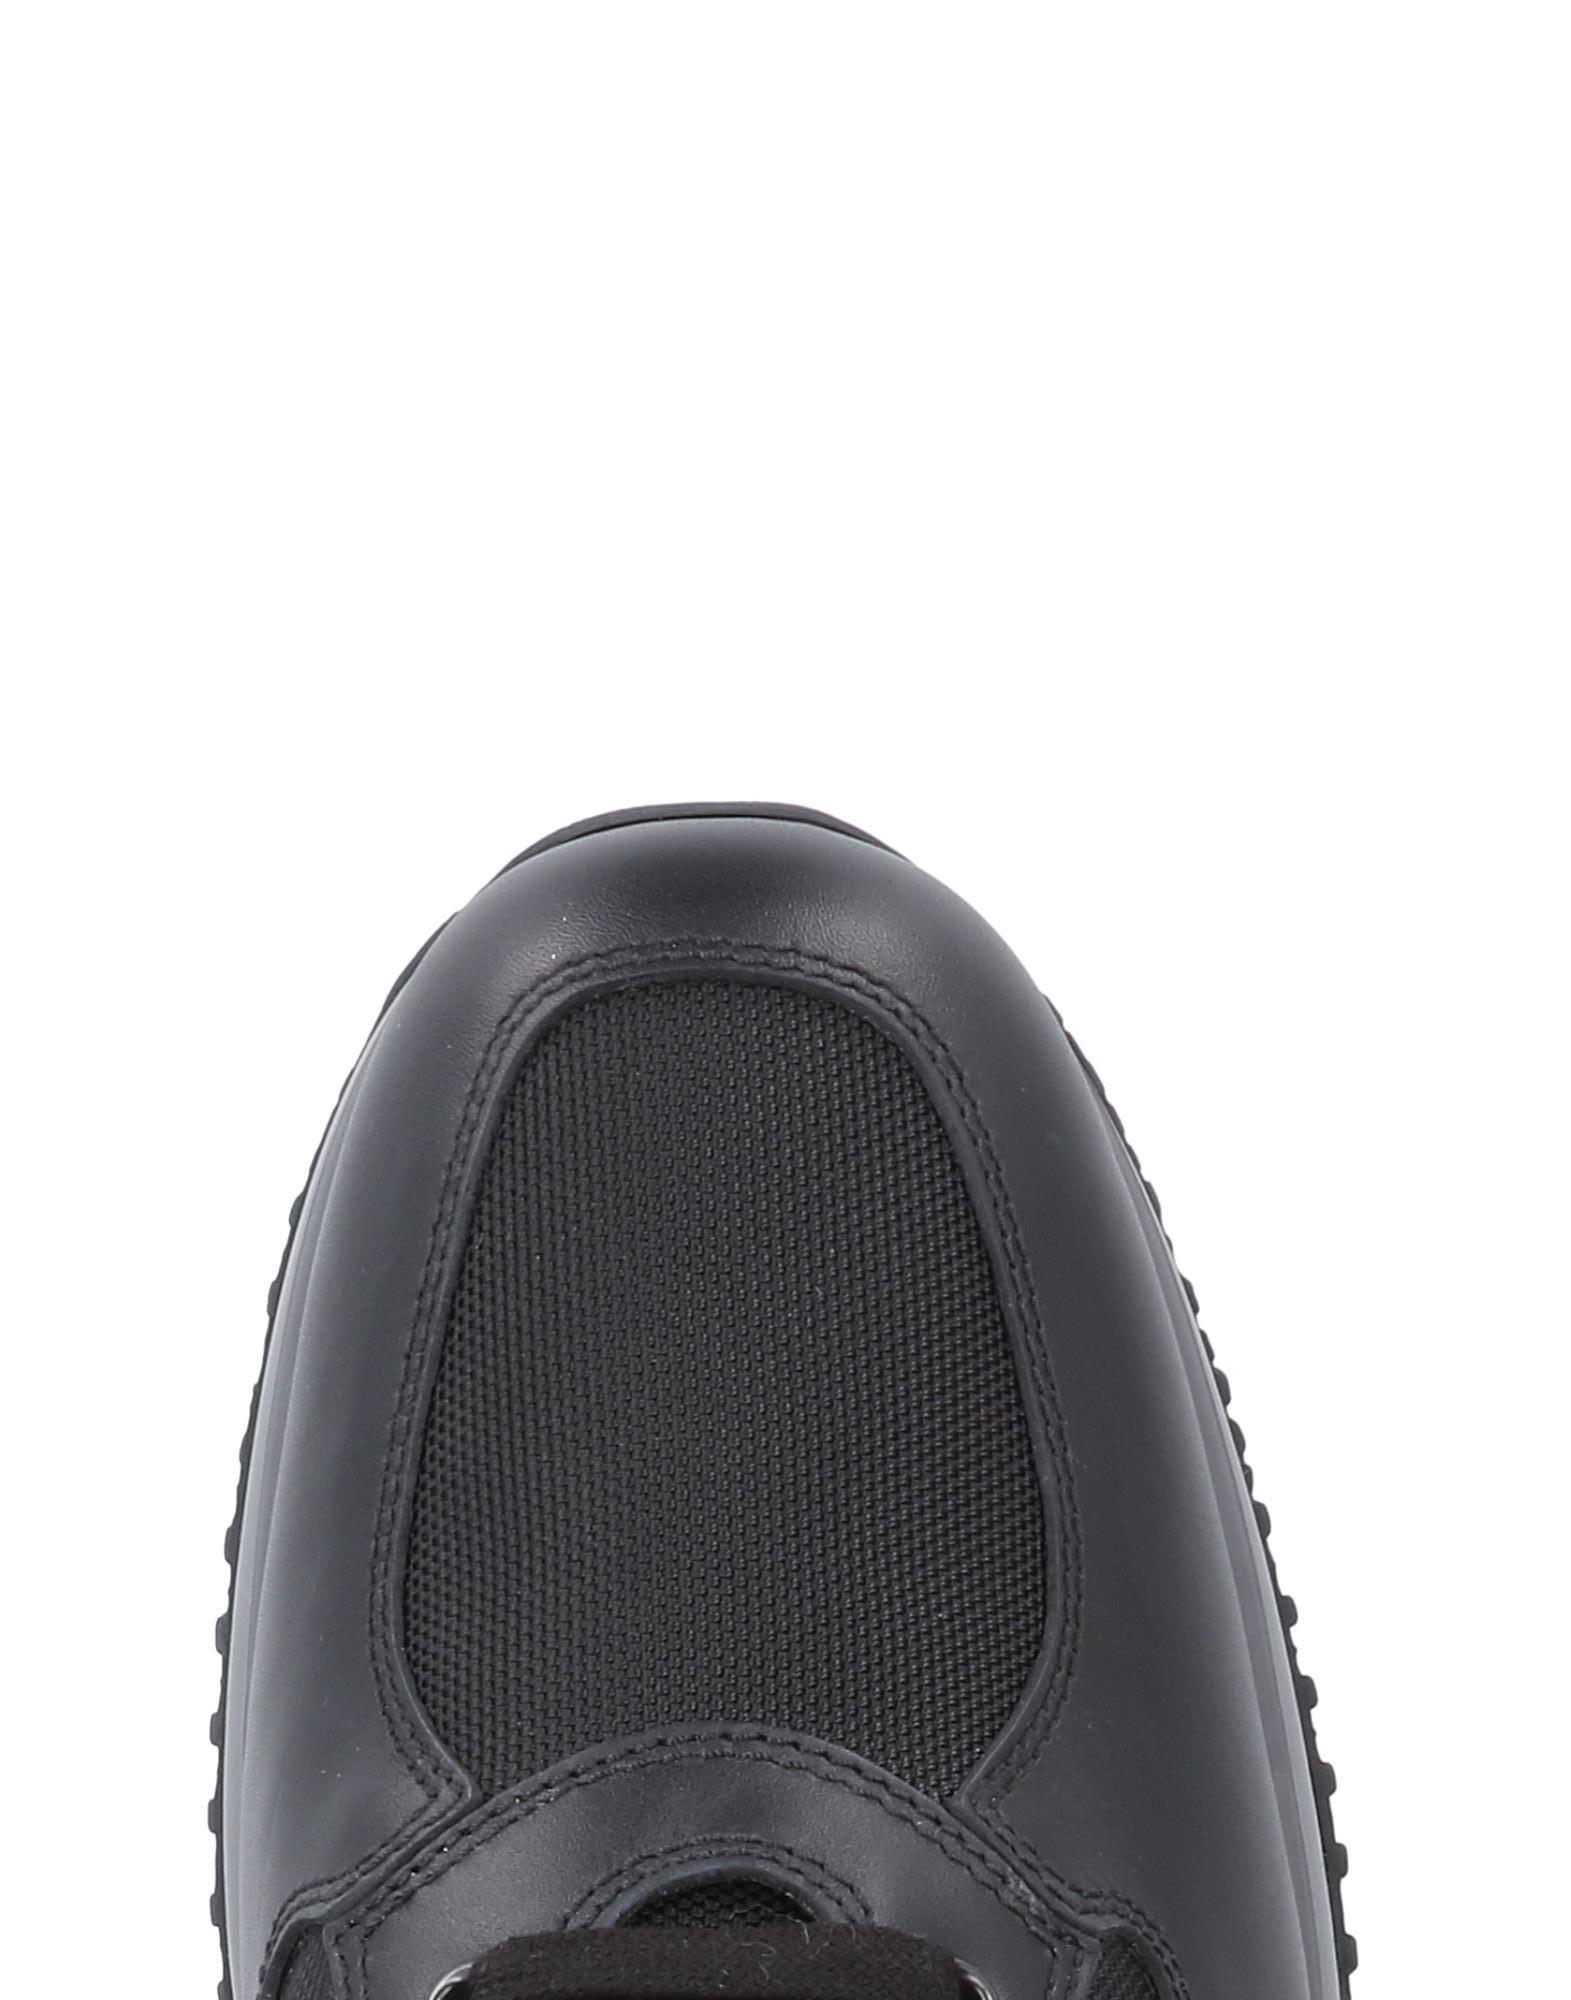 Hogan Sneakers Sneakers Sneakers - Men Hogan Sneakers online on  Australia - 11494493KQ b99399